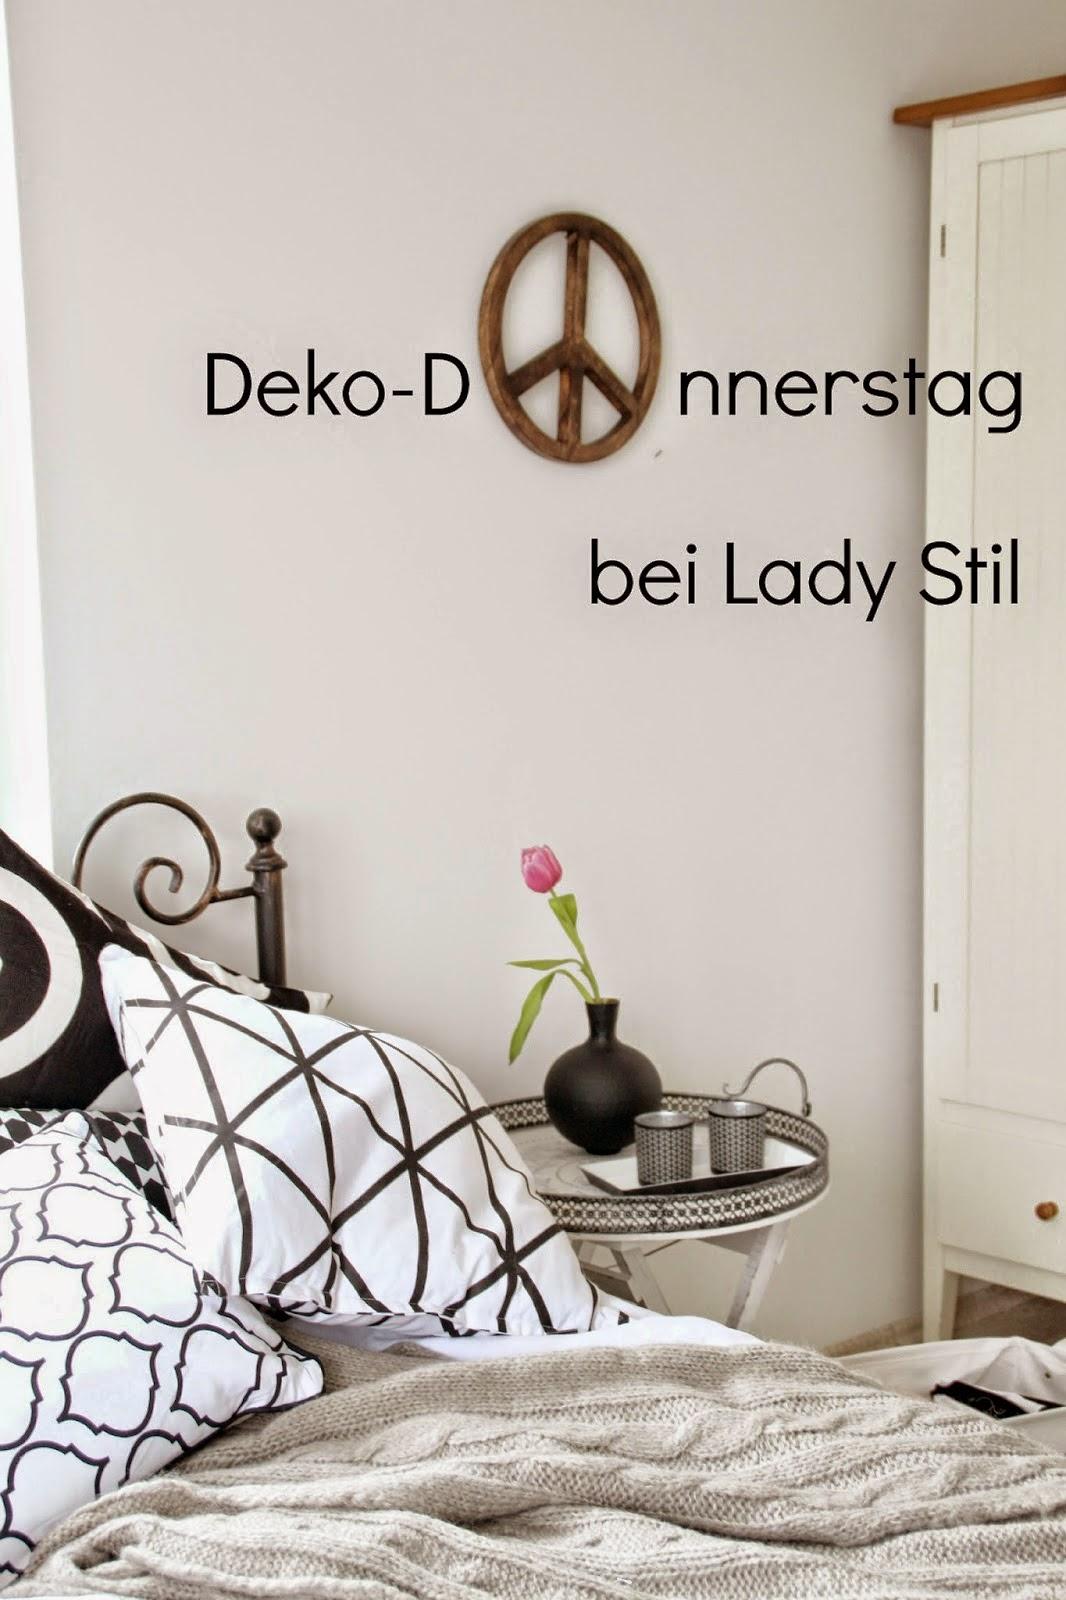 http://ladystil.blogspot.de/2015/02/neu-der-deko-donnerstag-heute-im.html